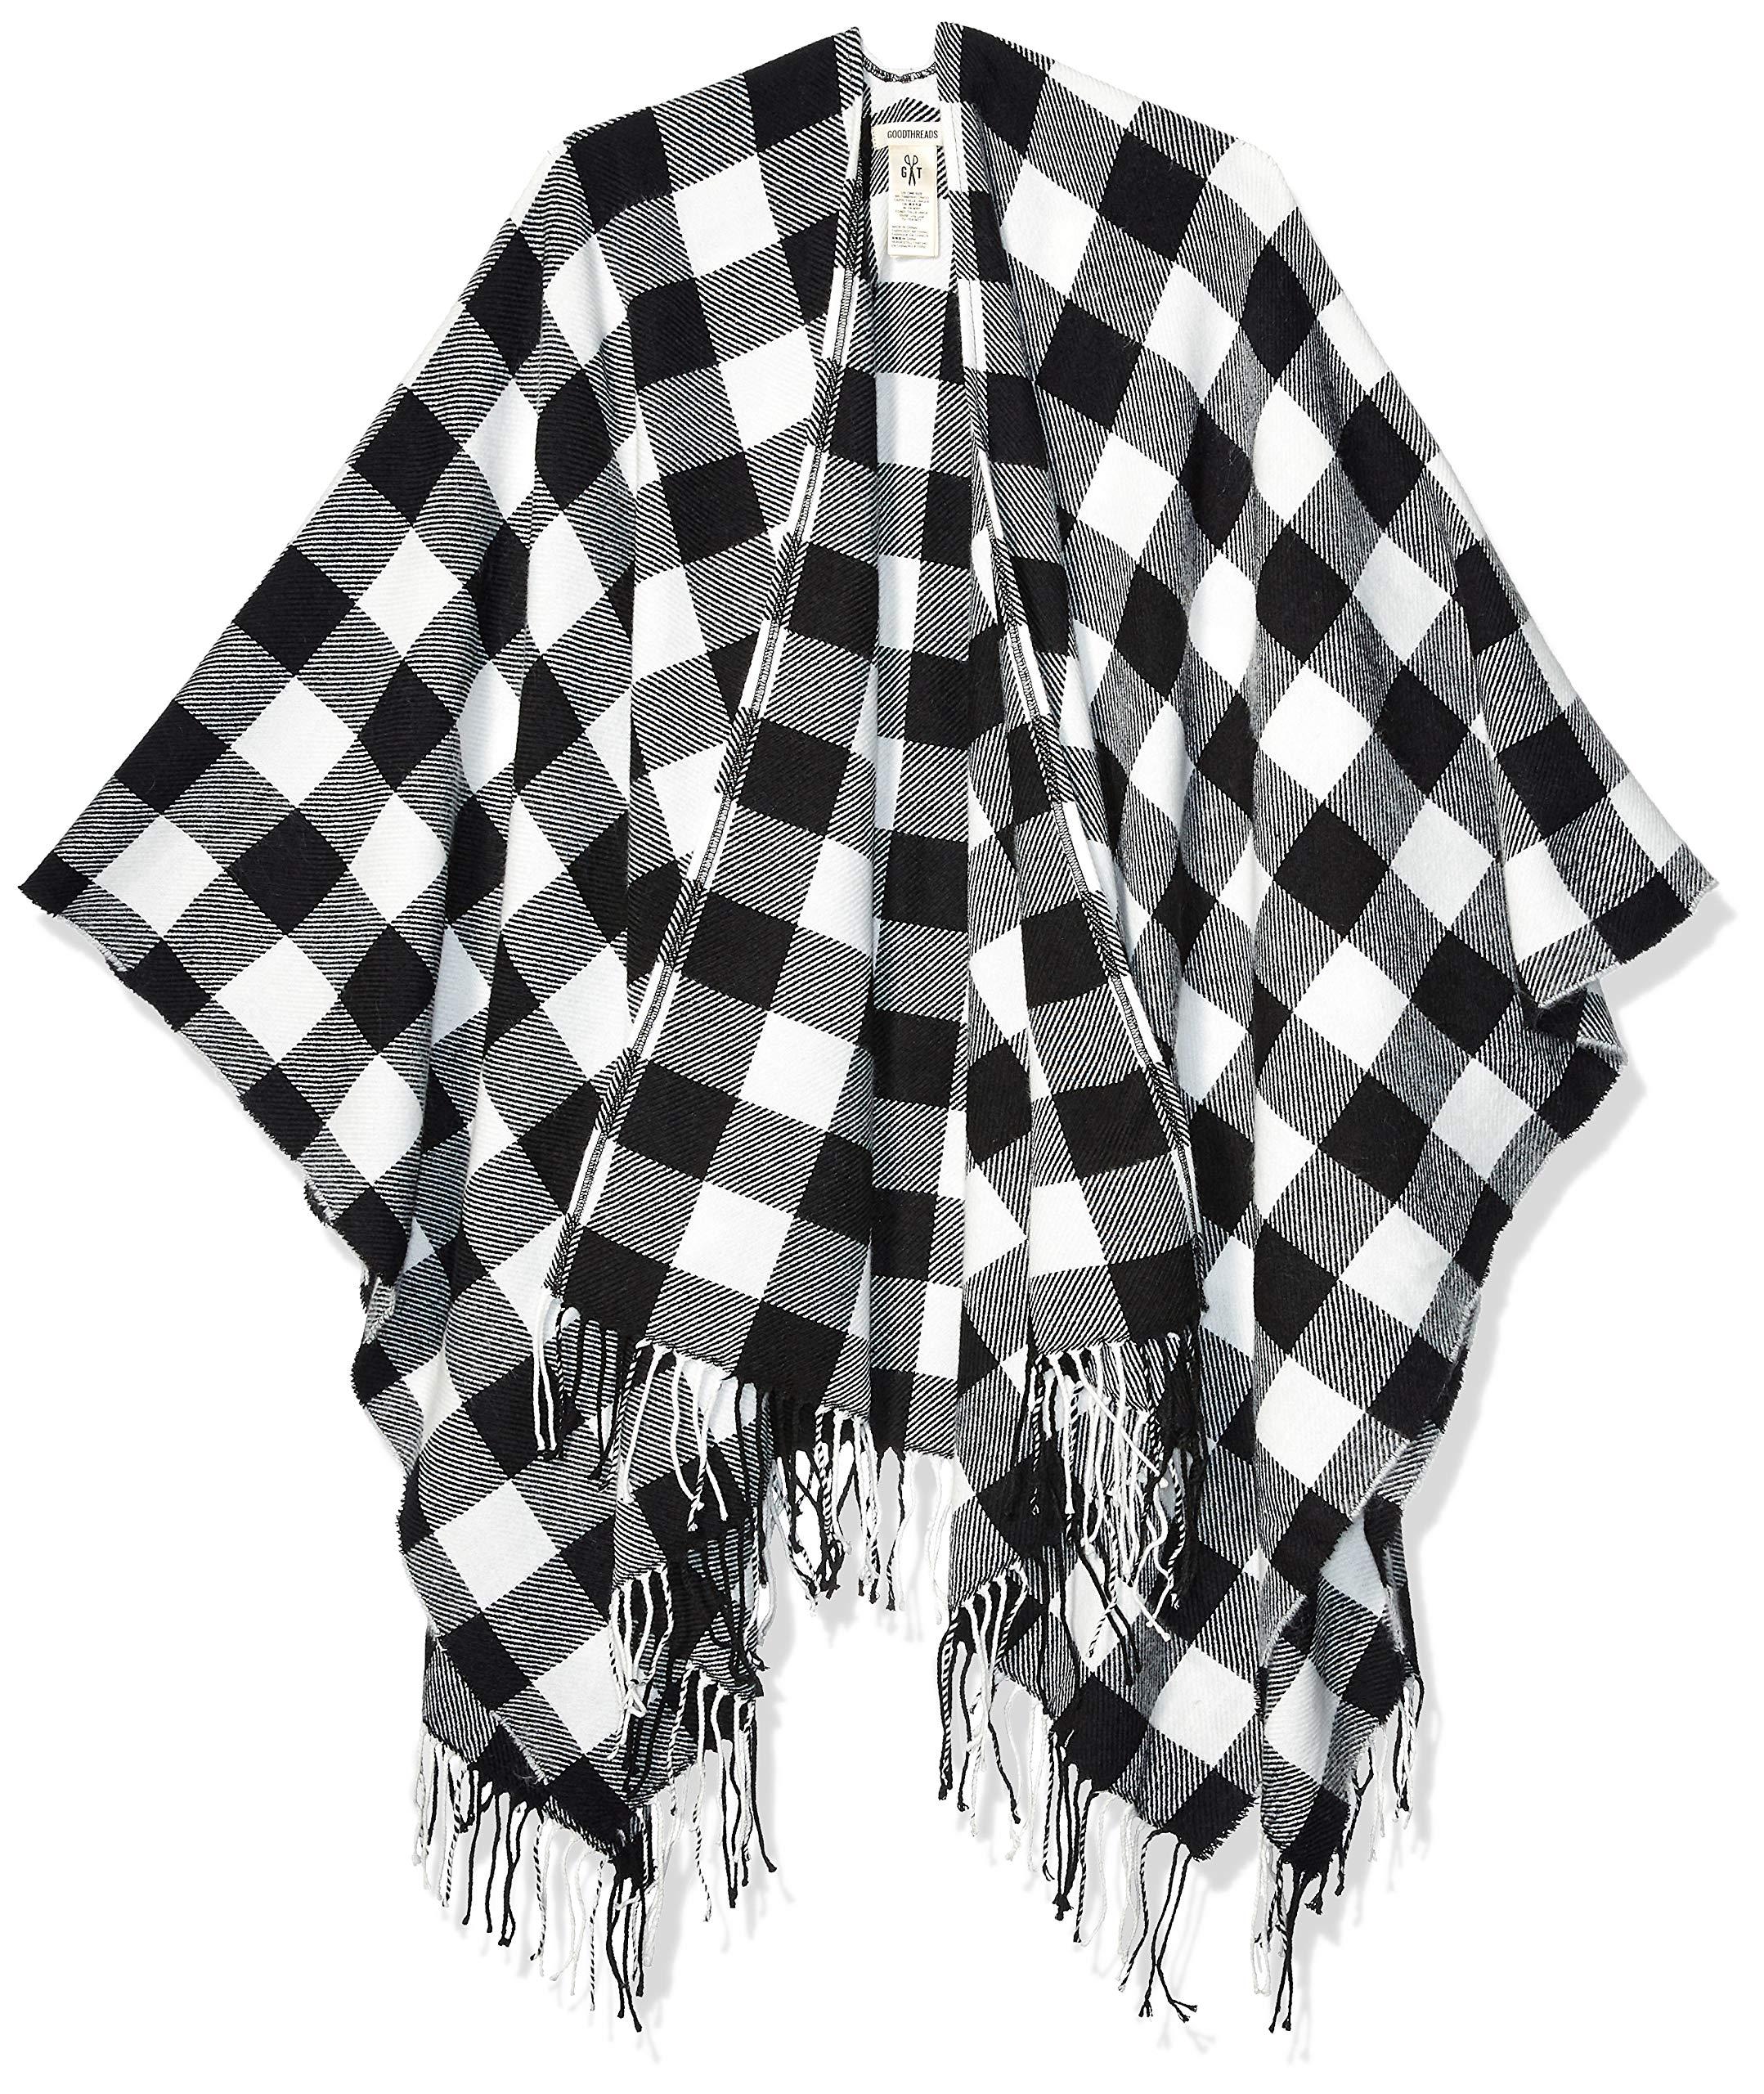 Amazon Brand - Goodthreads Women's Fringe Ruana Wrap, Cream/Black Buffalo Plaid One Size by Goodthreads